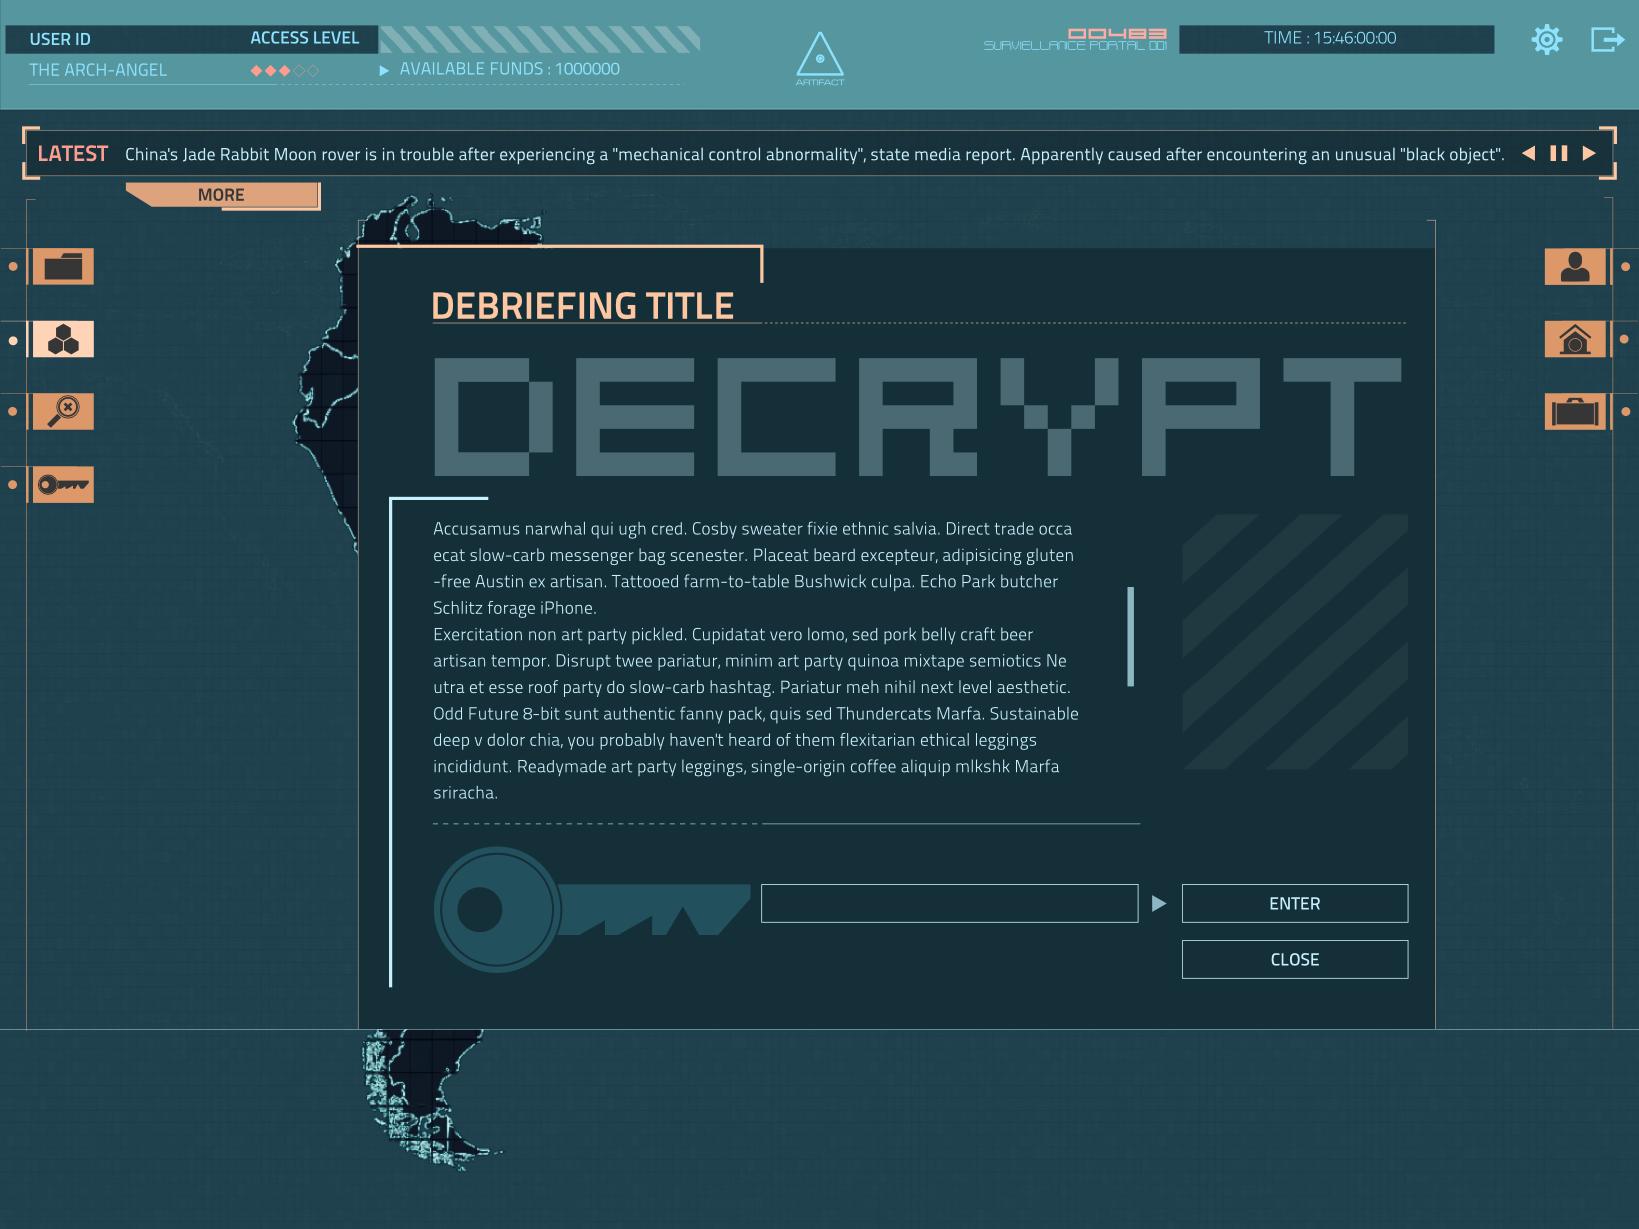 Trade_Main Mission DeBrief Decrypt minga